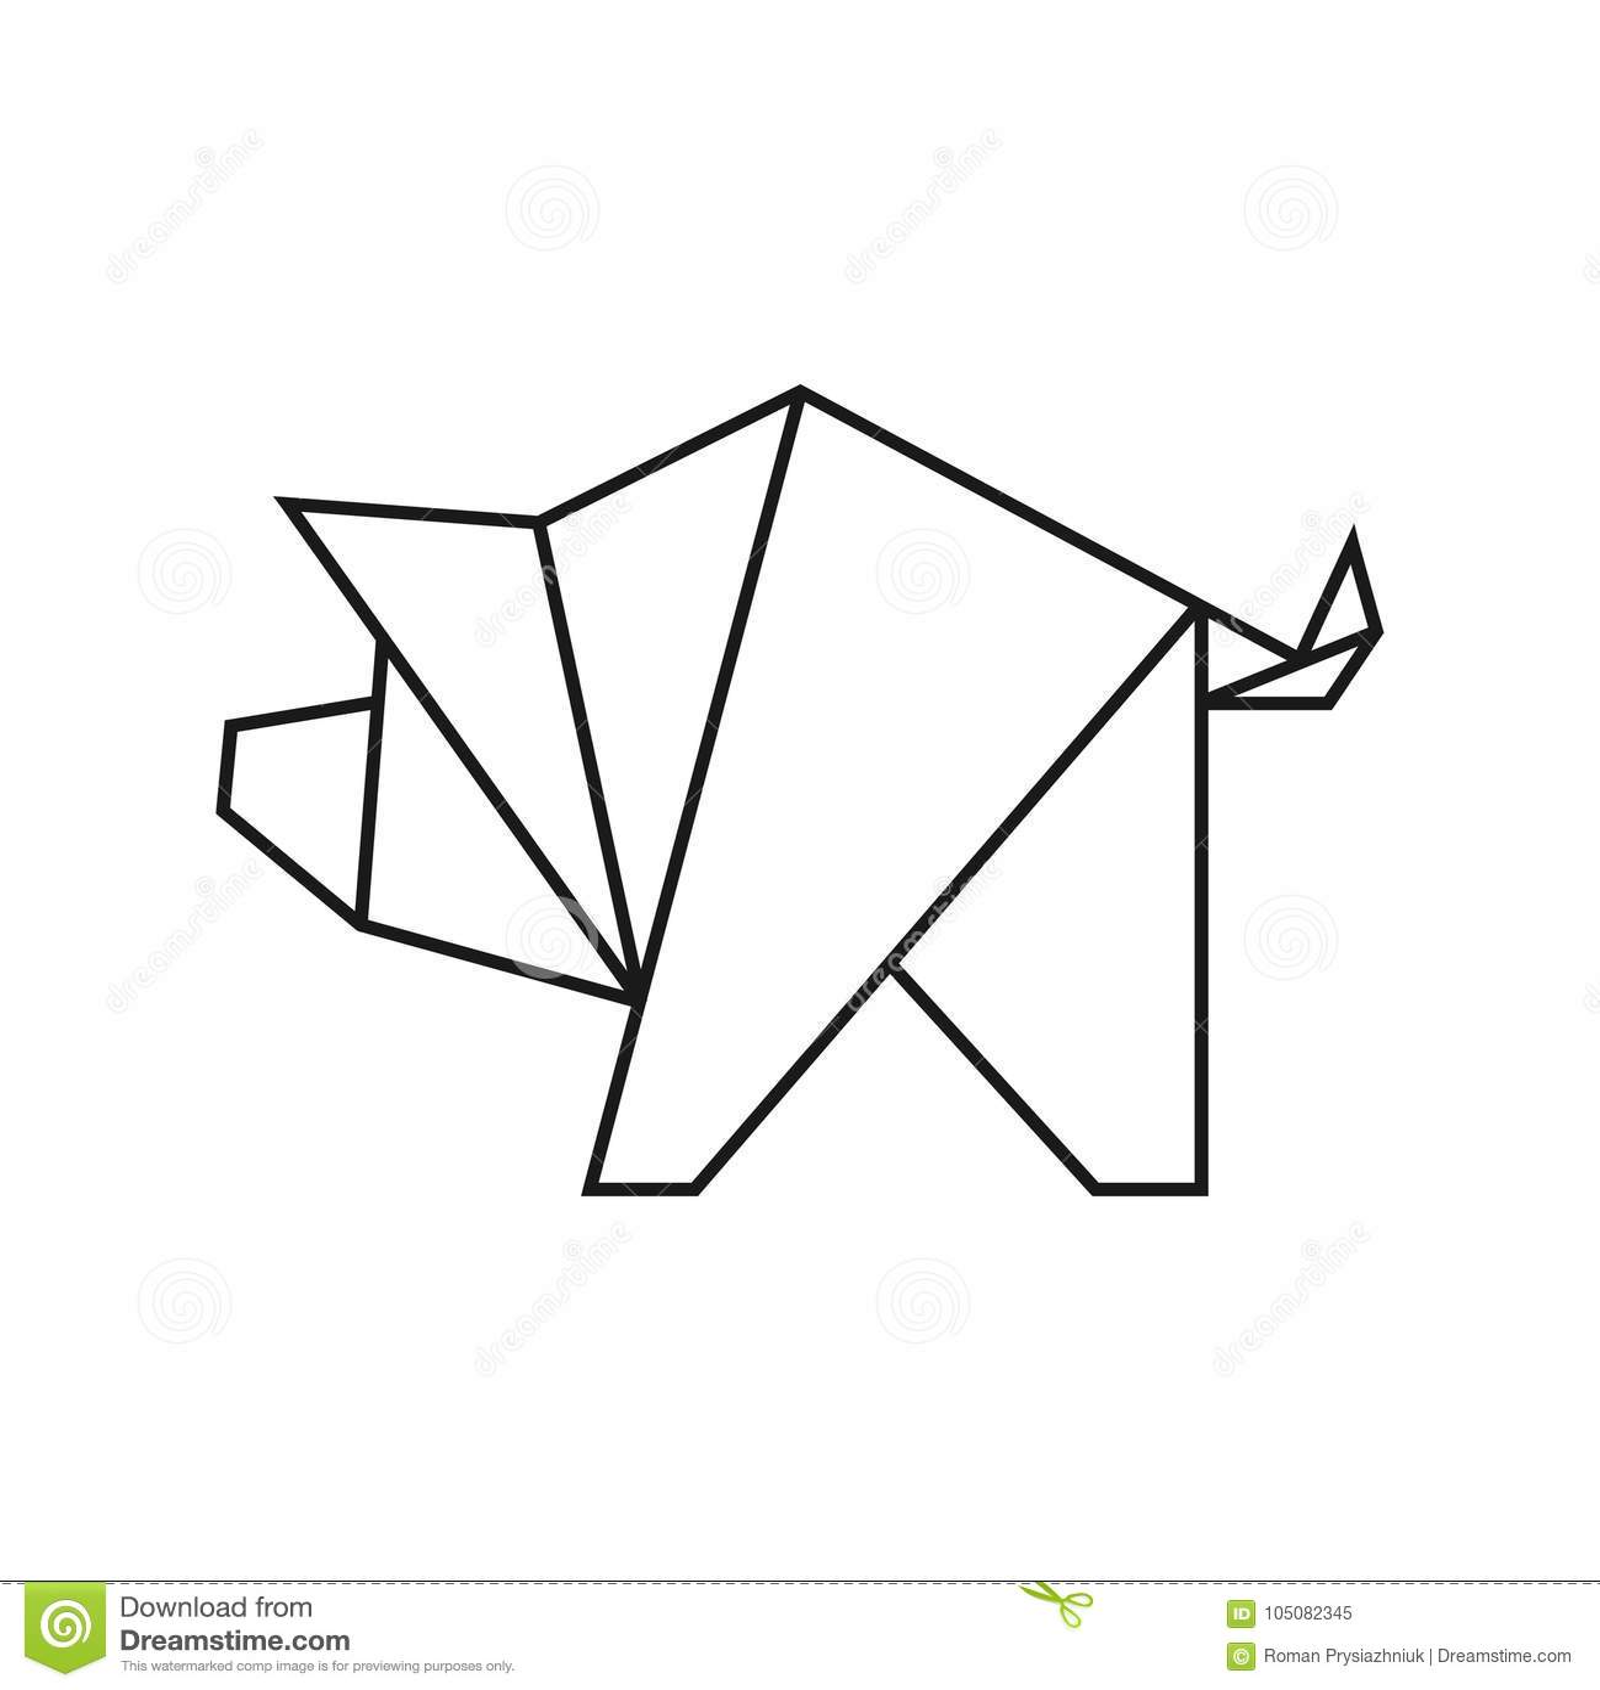 Origami Pig. Geometric Line Shape For Art Of Folded Paper